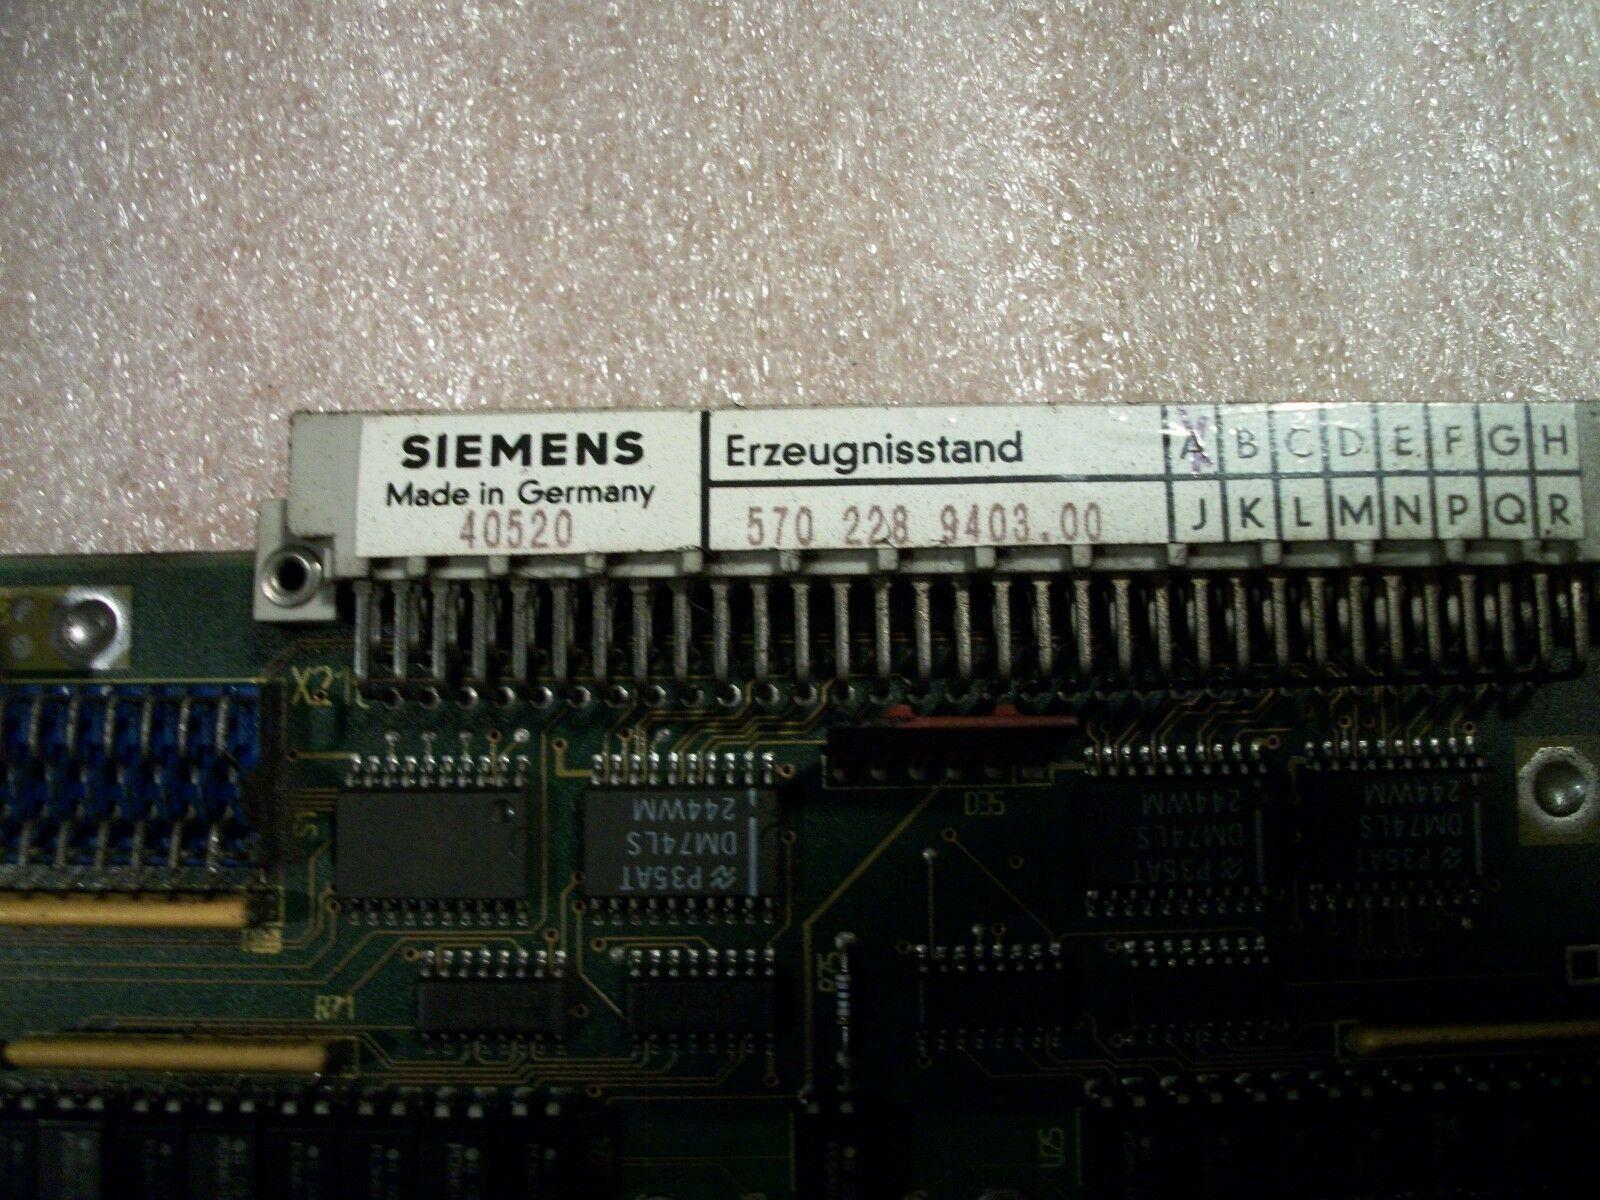 Siemens CNC Control Circuit Board 570 228 9403.00 / OE 570228.0005.00